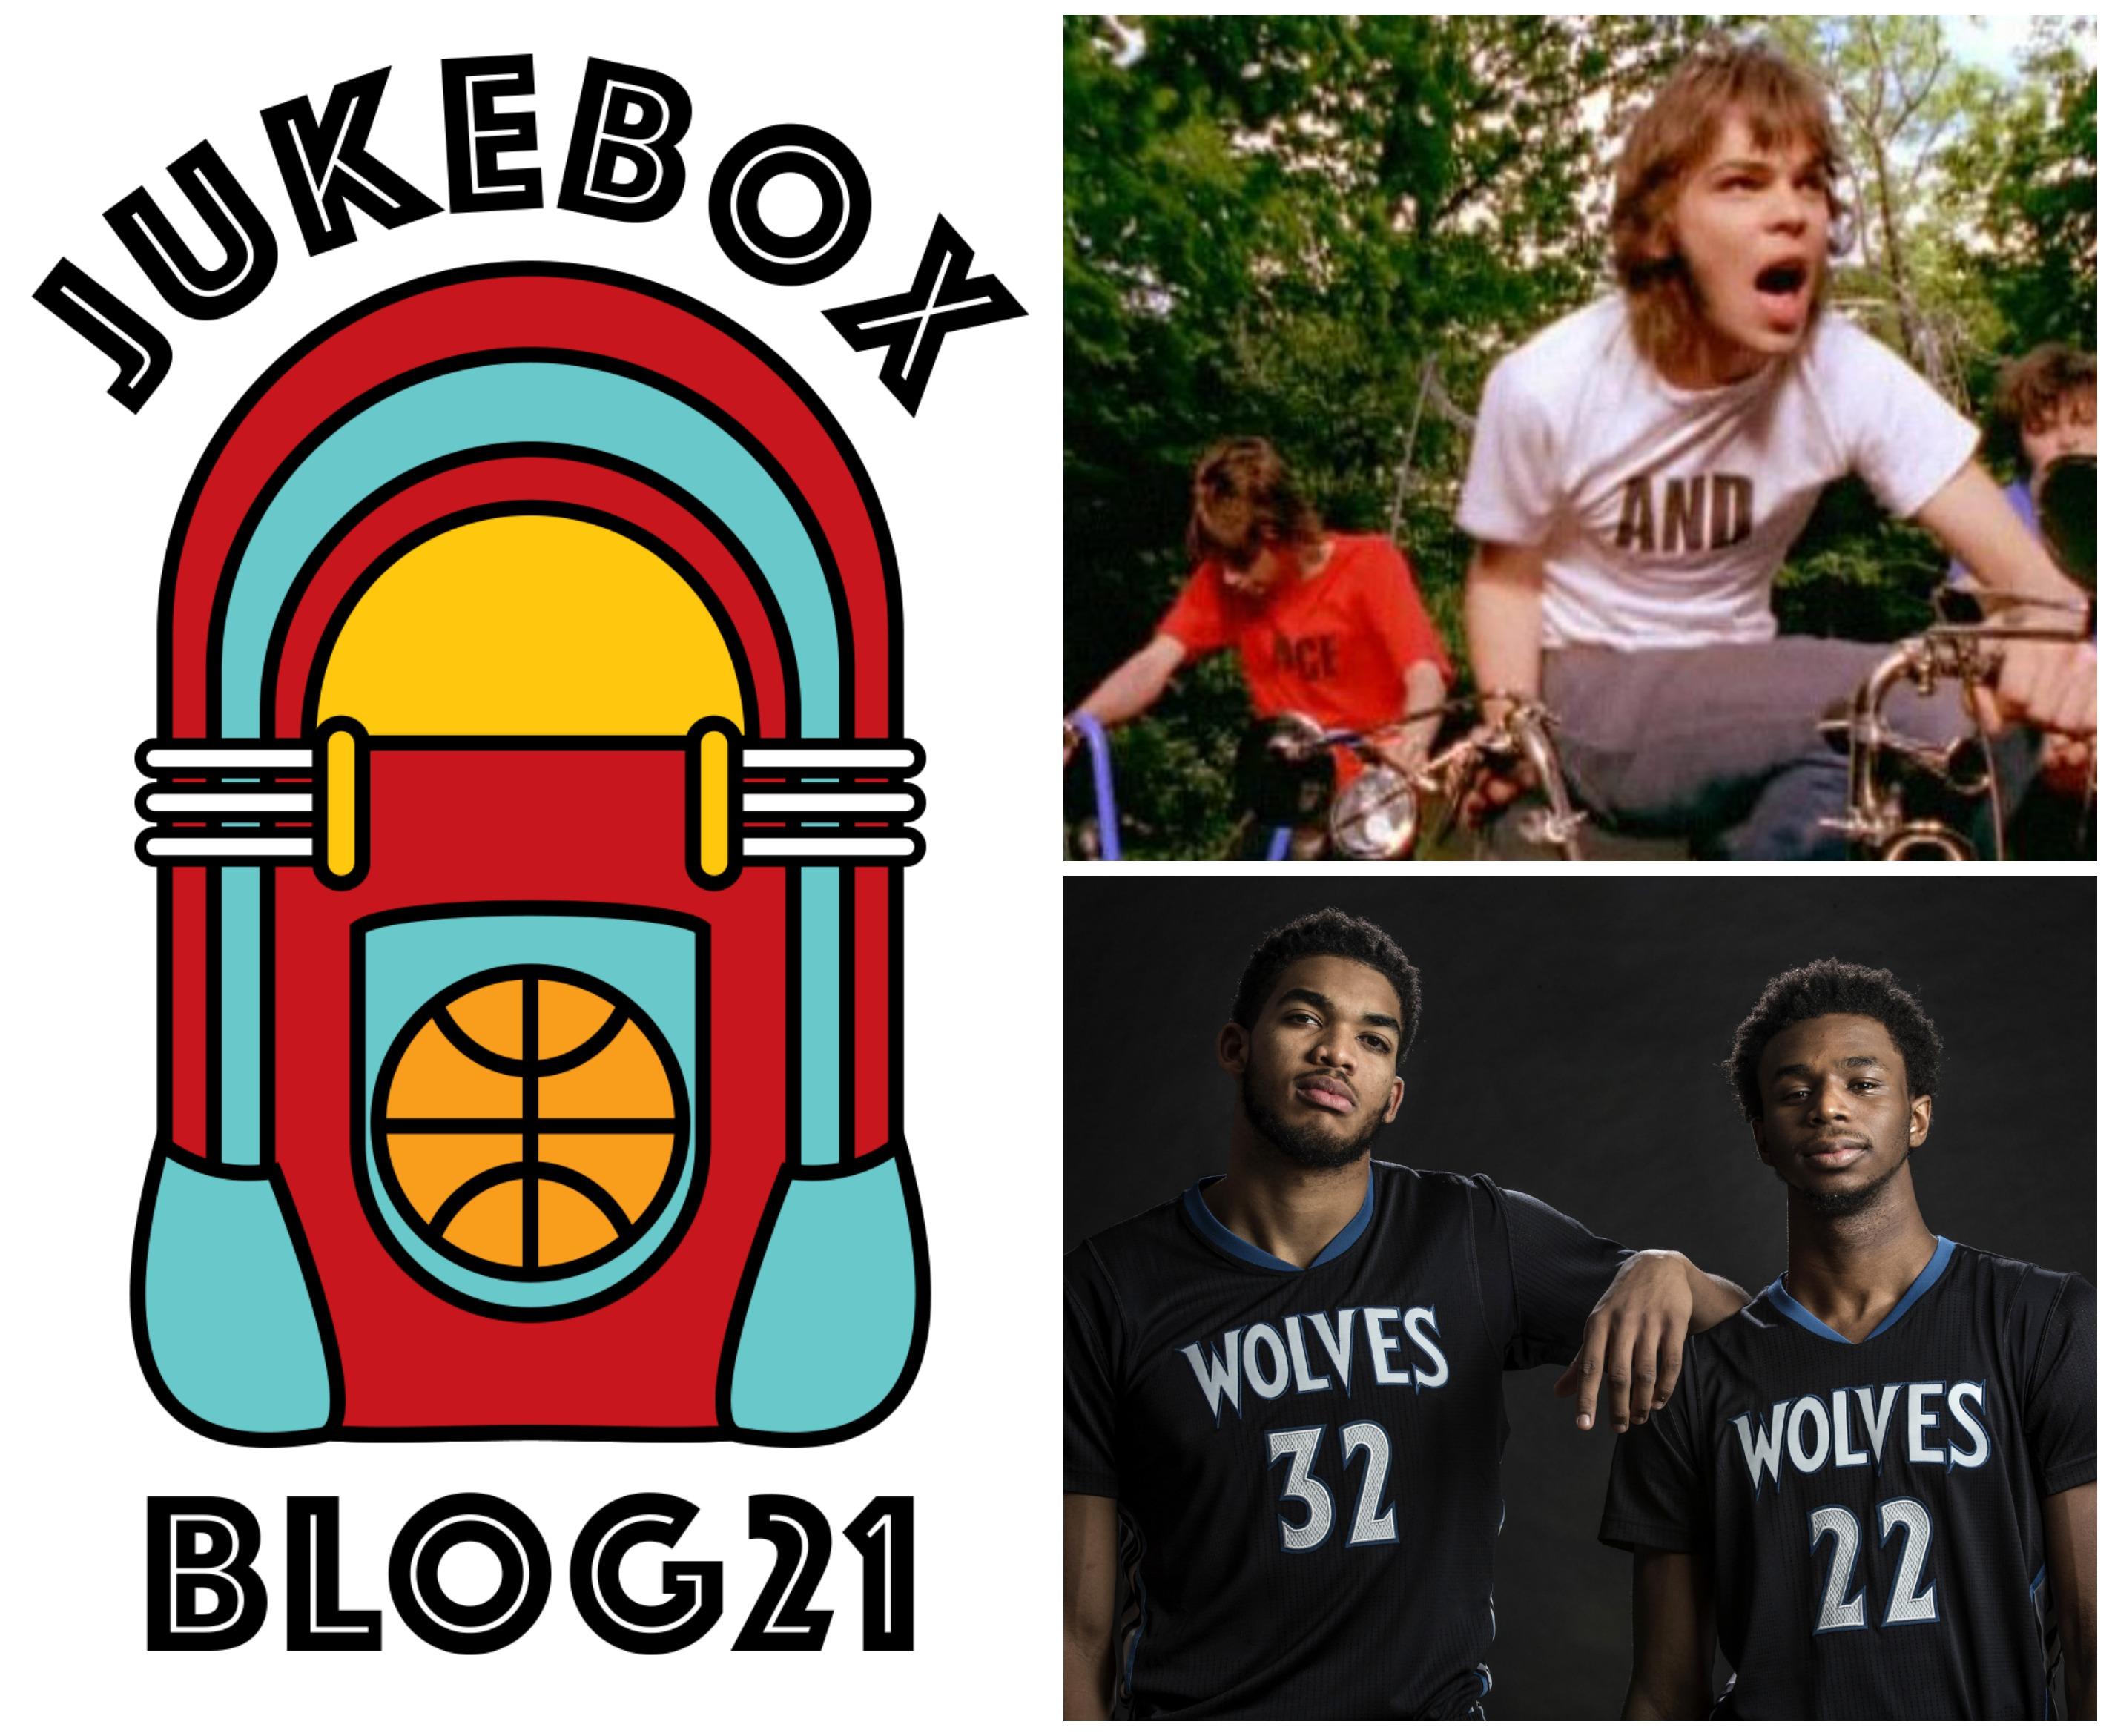 44273b0f54 jukebox-wolves-supergrass